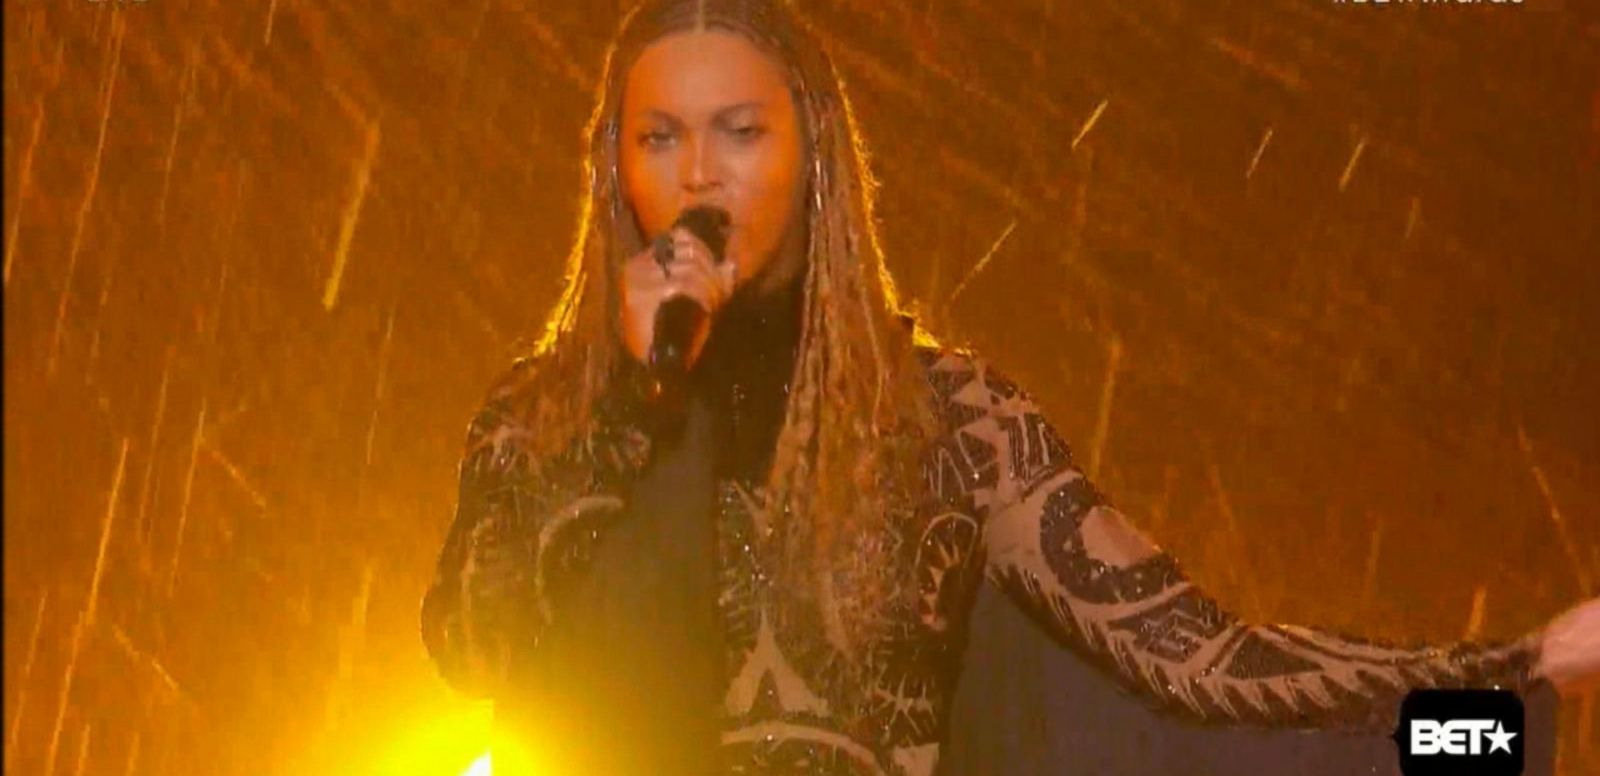 VIDEO: Beyoncé Surprises as Opener of 2016 BET Awards